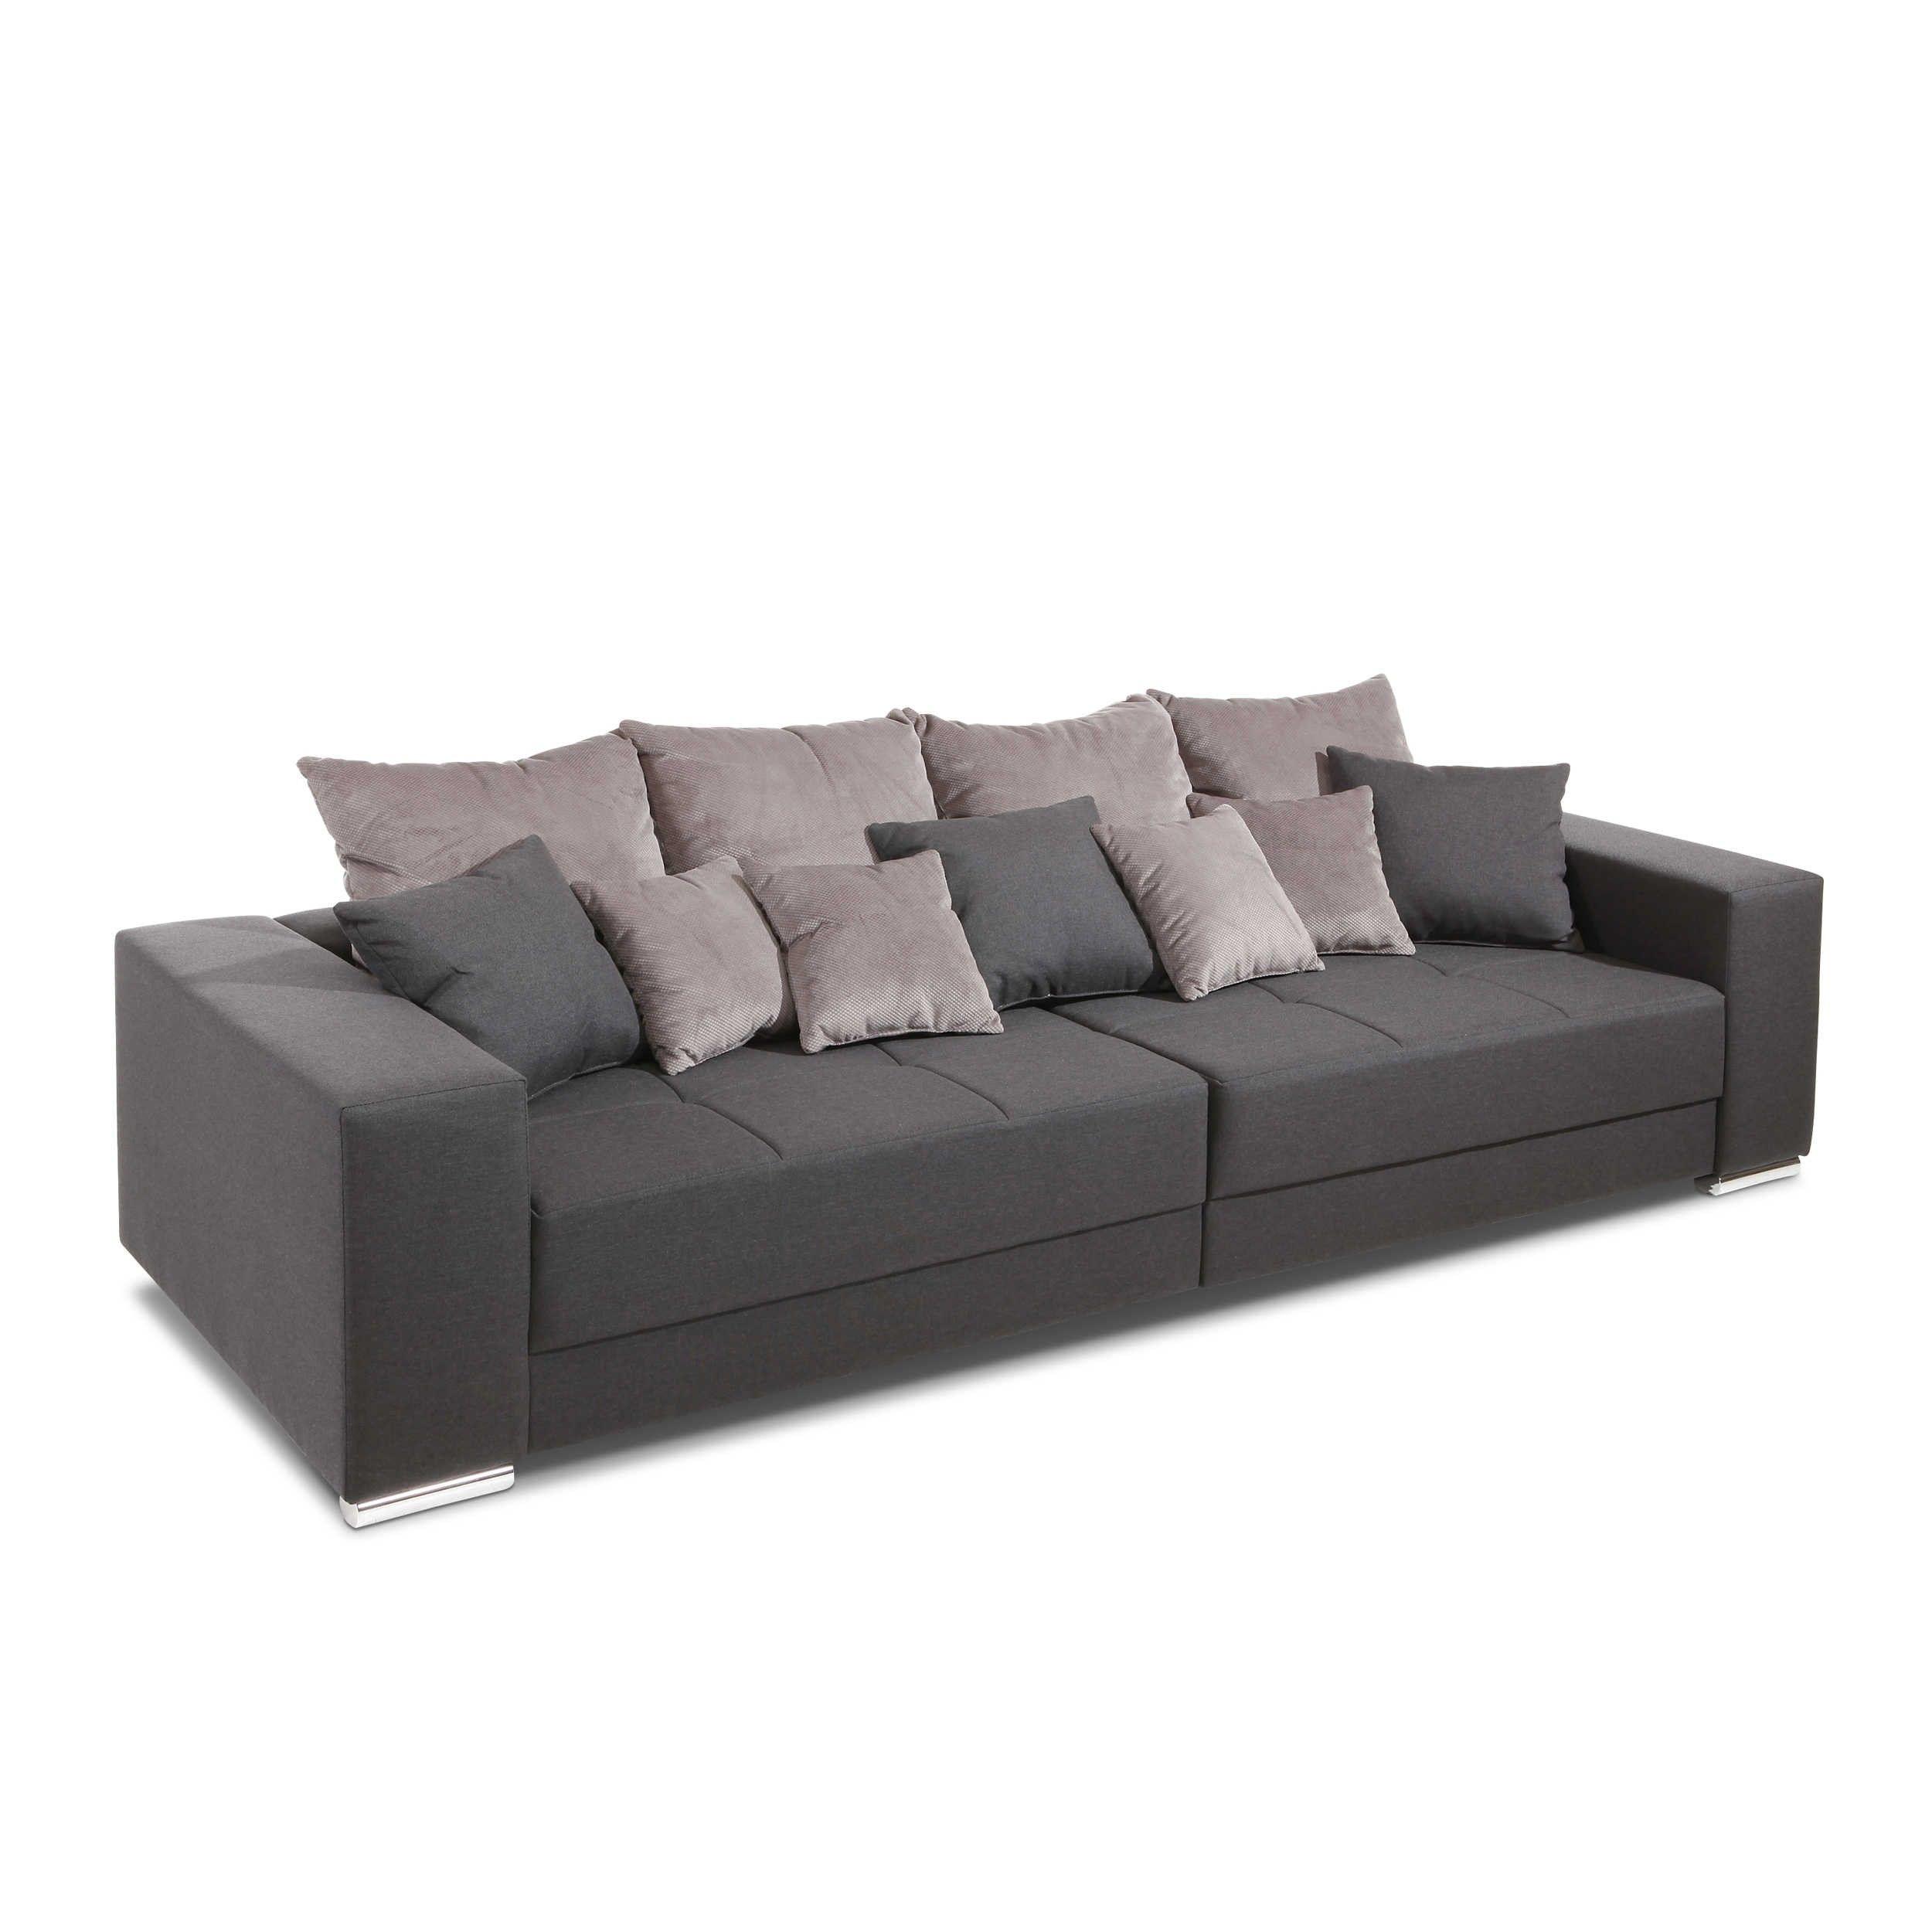 wohnzimmermobel oslo : Sofa Seaford Gesehen Auf Loberon De Pinterest Sofa